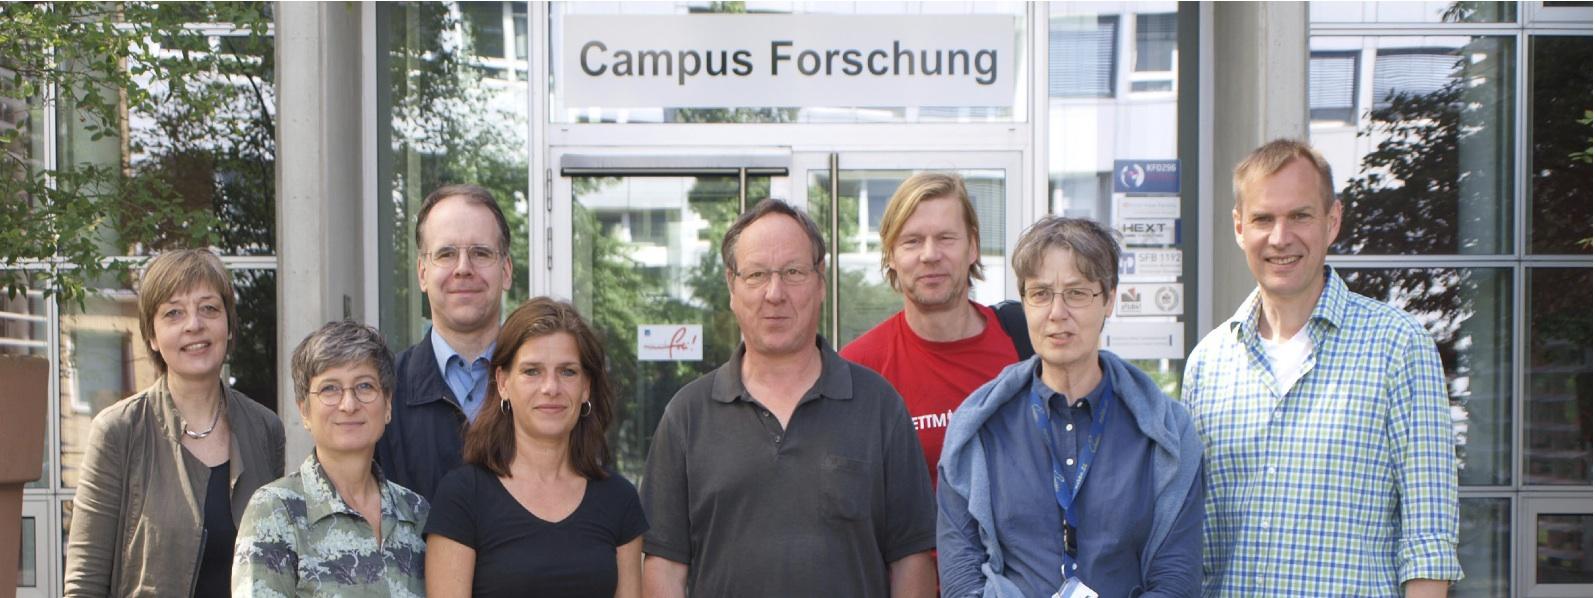 Bündnis Wissenschaft für den Fakultätsrat